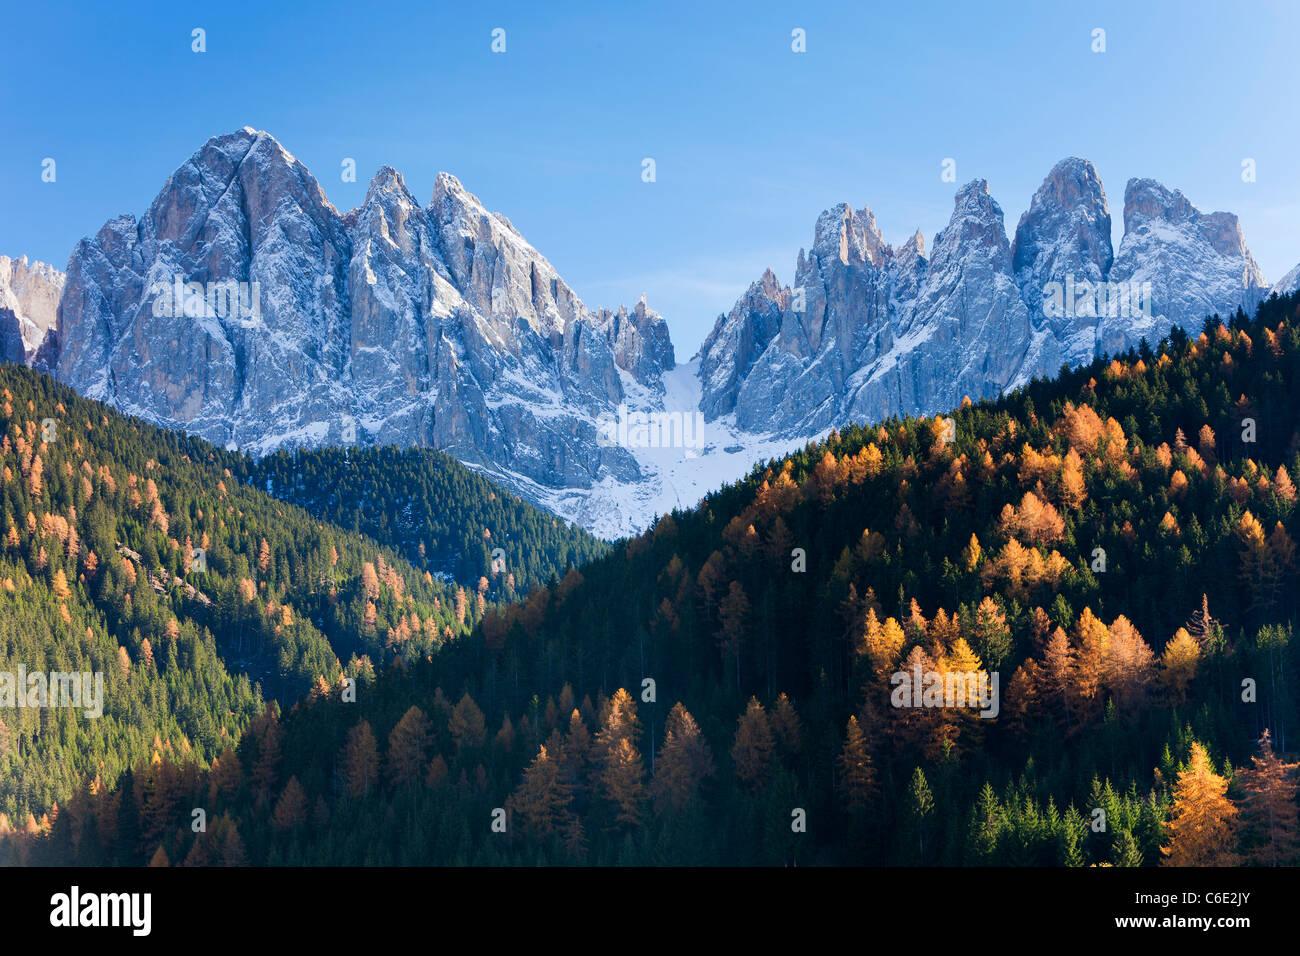 Berge, Geisler Gruppe / Geislerspitzen, Dolomiten, Trentino-Alto Adige, Italien, Europa Stockbild